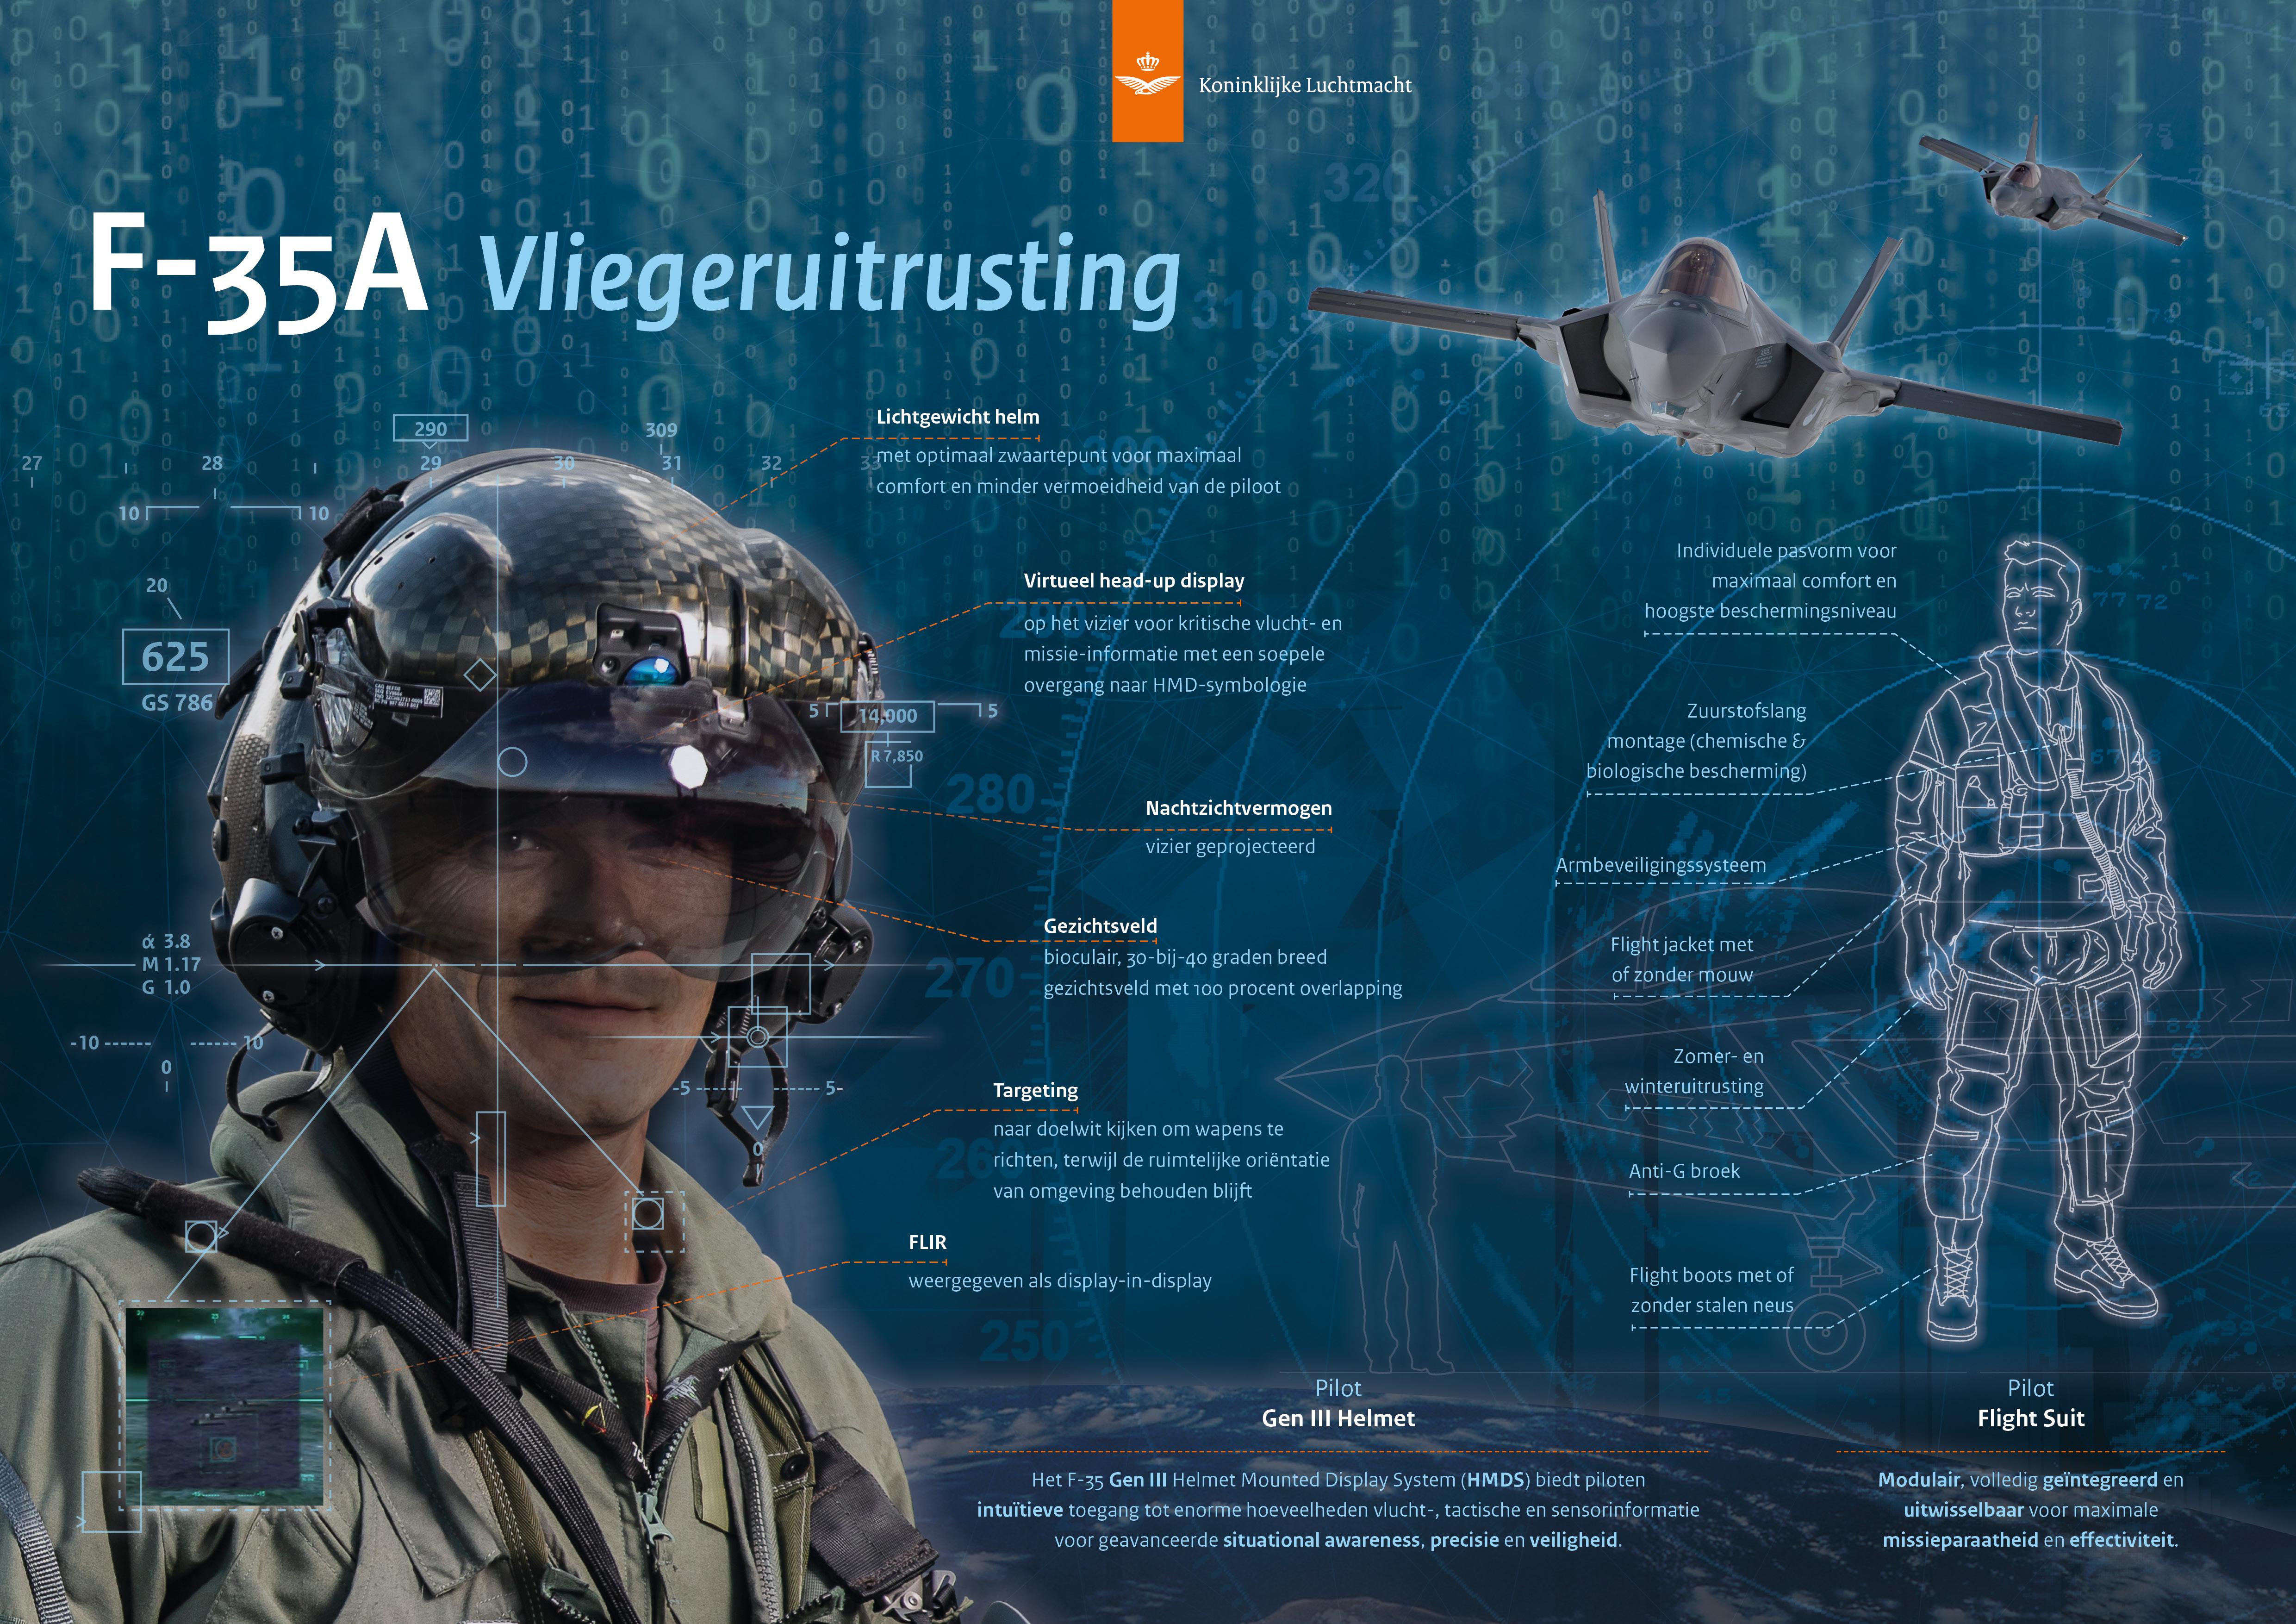 KLu infographic F-35 Lightning II, vliegeruitrusting